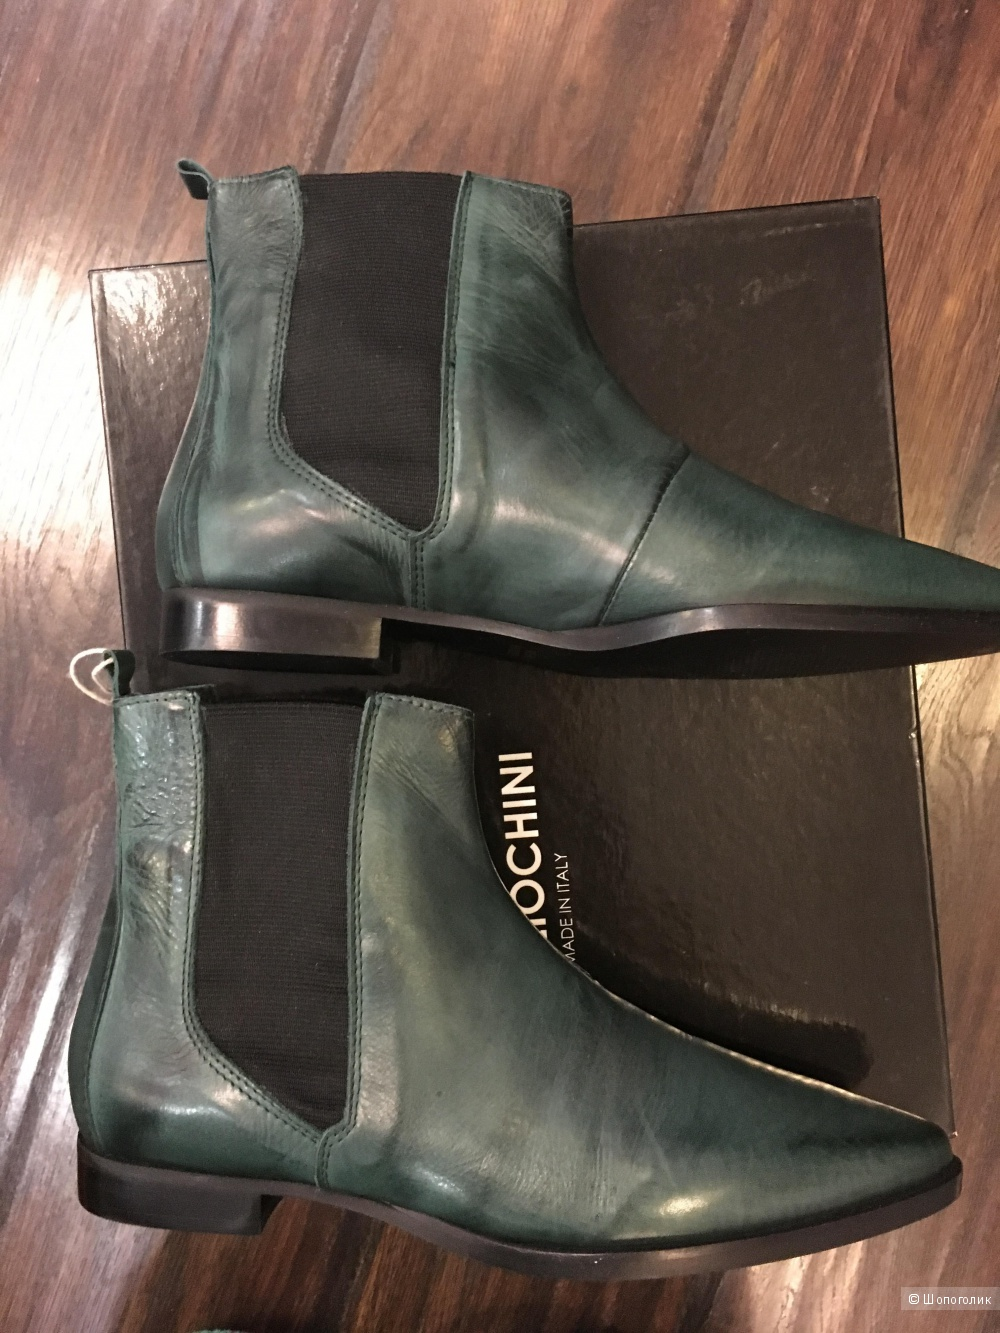 Ботинки челси FABRIZIO CHINI, 38 (Европейский Размер), 24,5 см